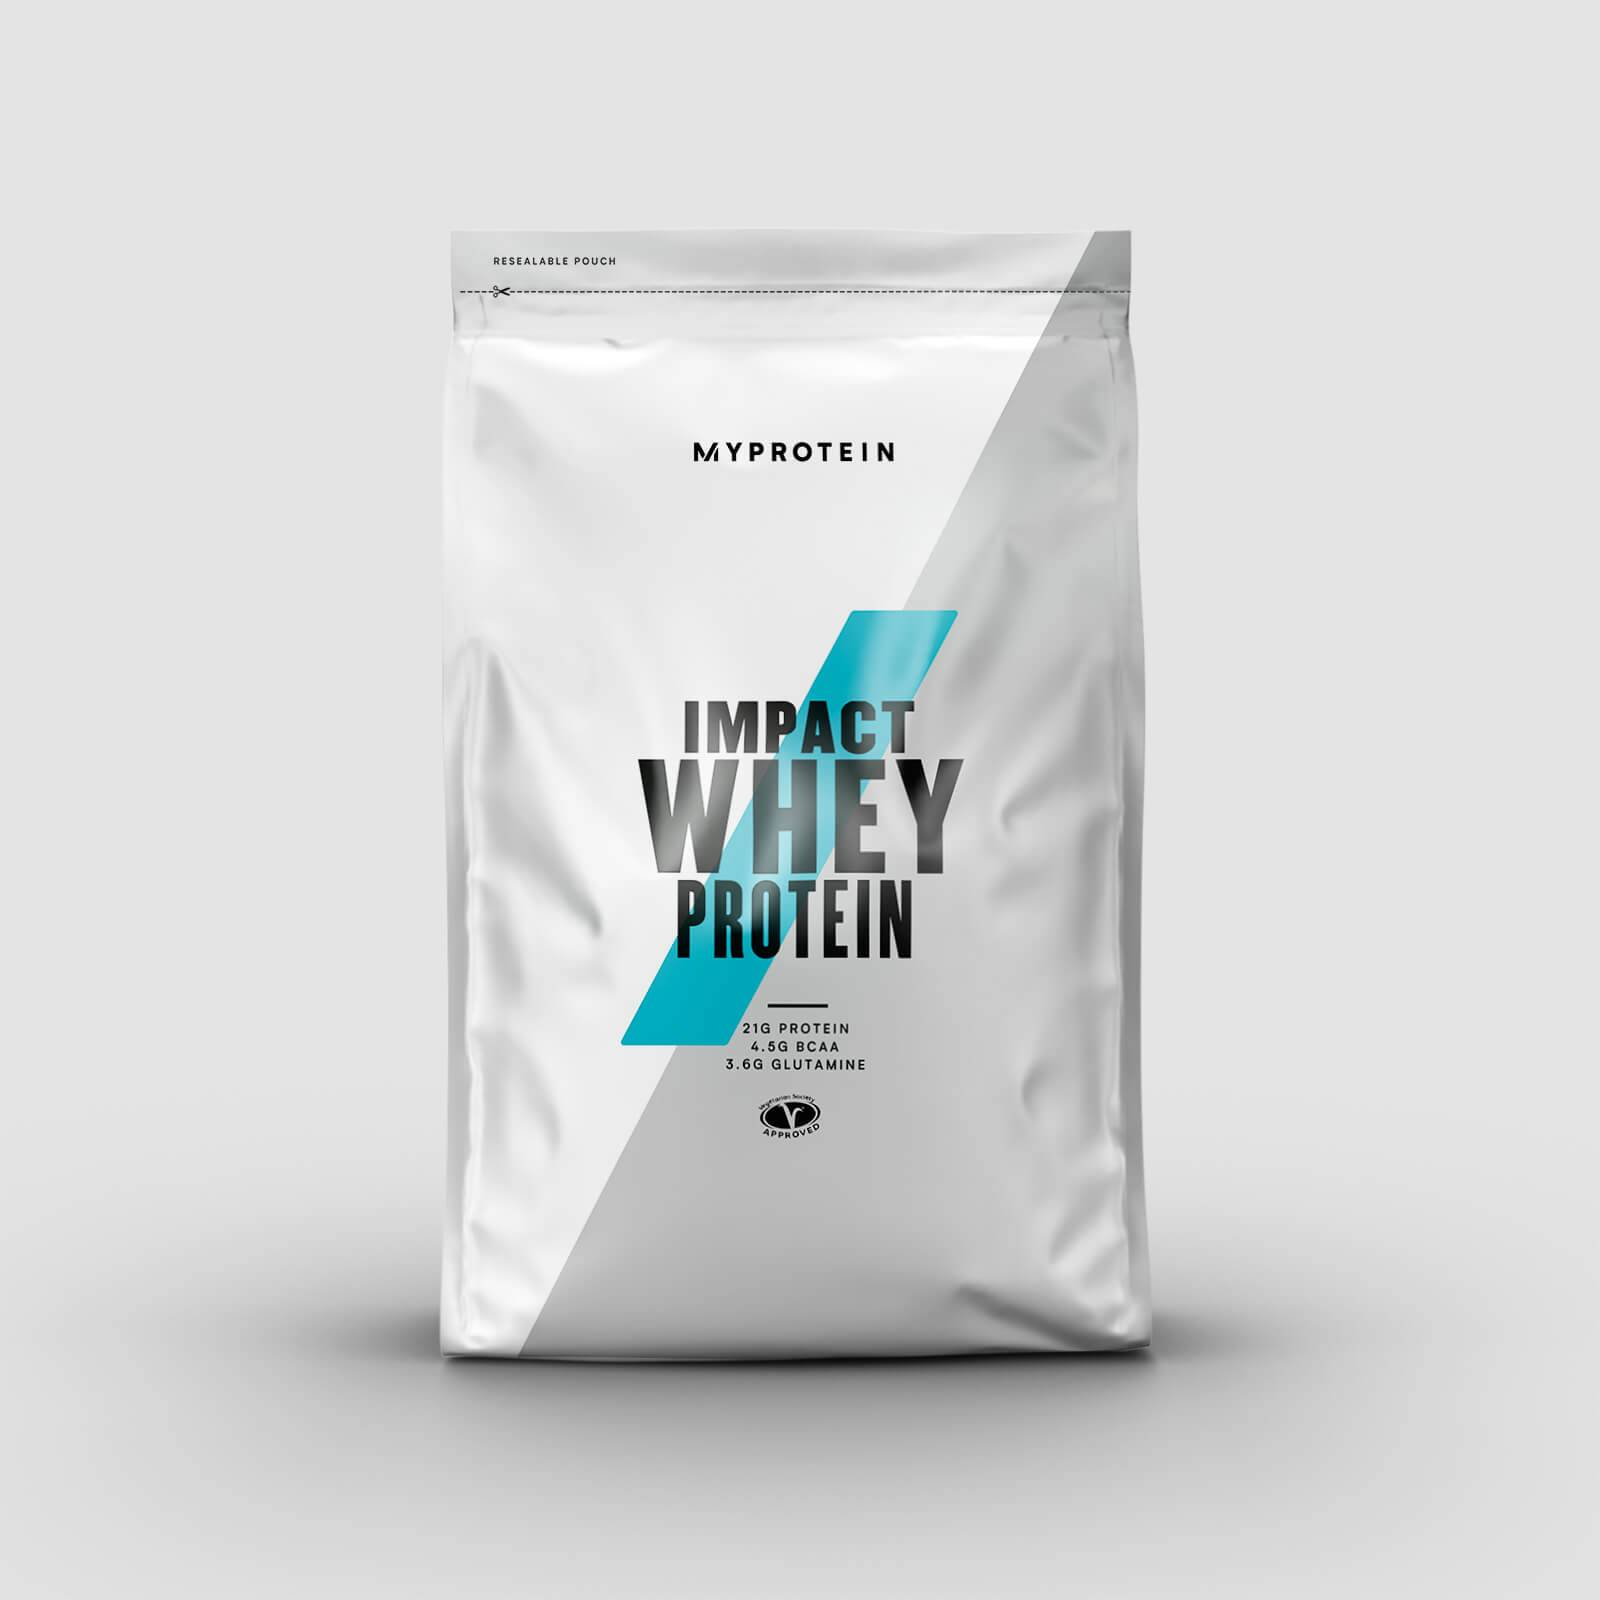 Myprotein Impact Whey Protein - 2.5kg - Noix chocolat